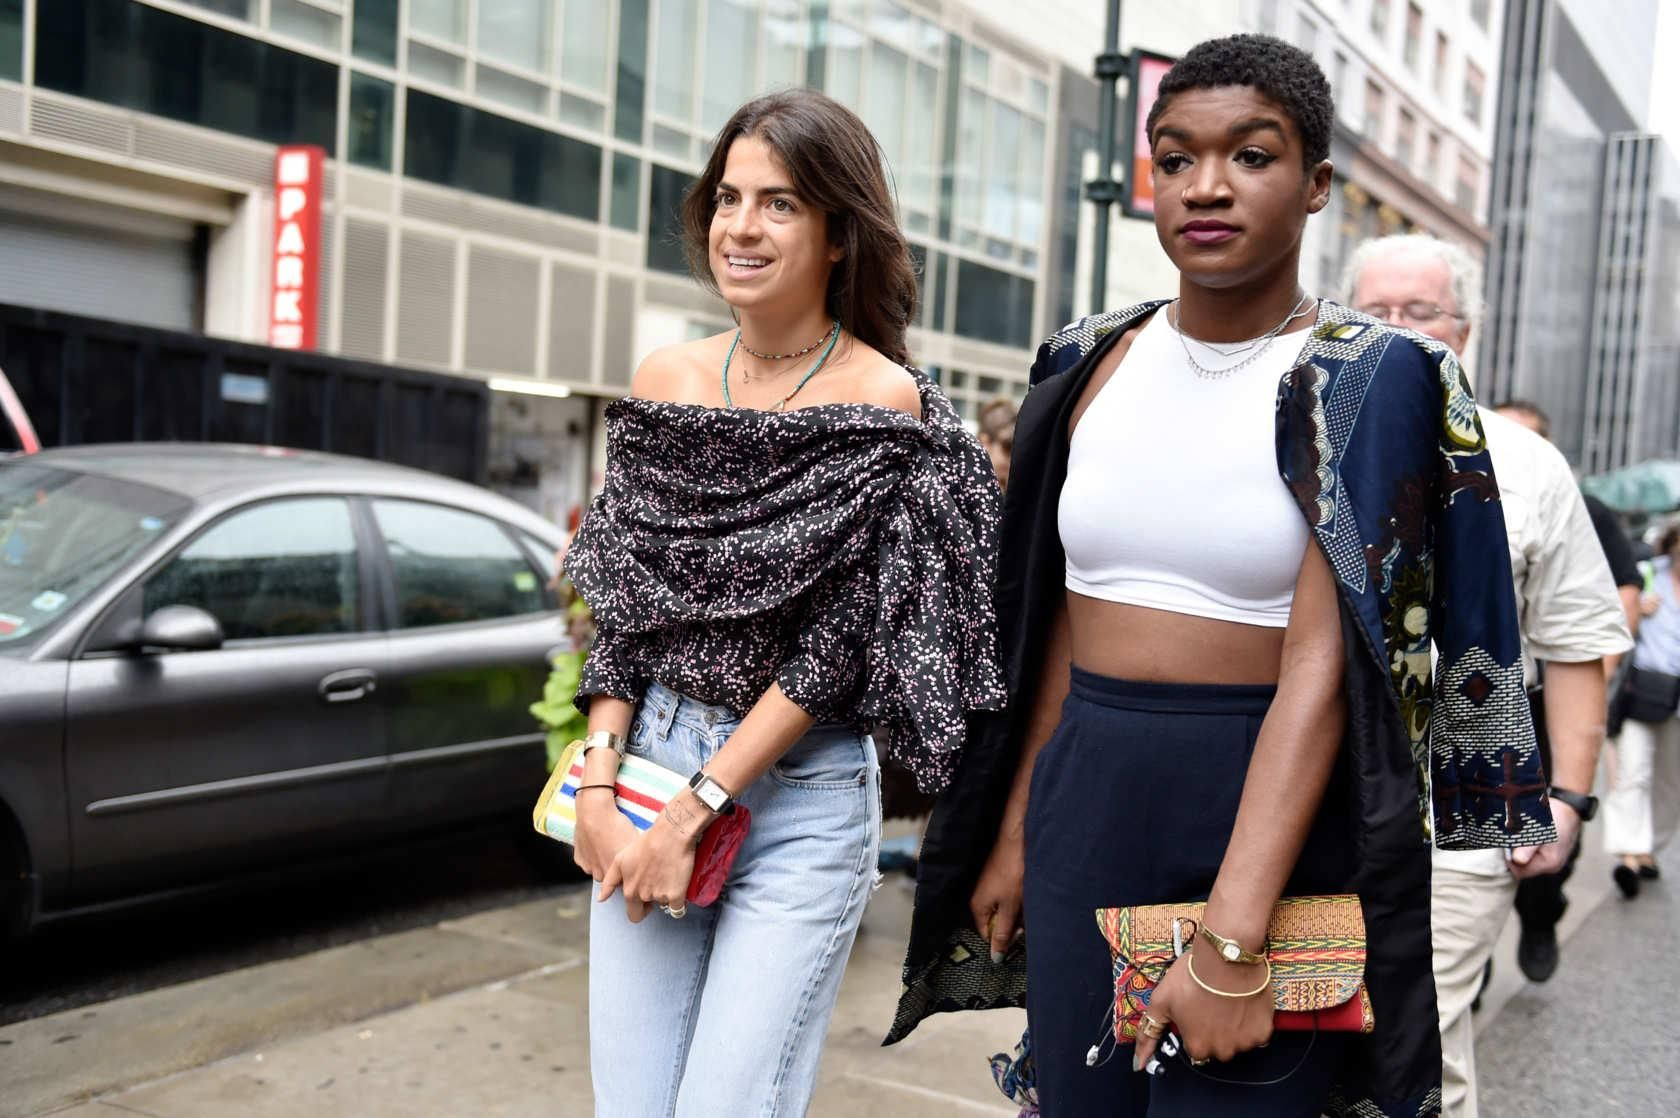 The Best Street Style of New York Fashion Week: Leandra Medine